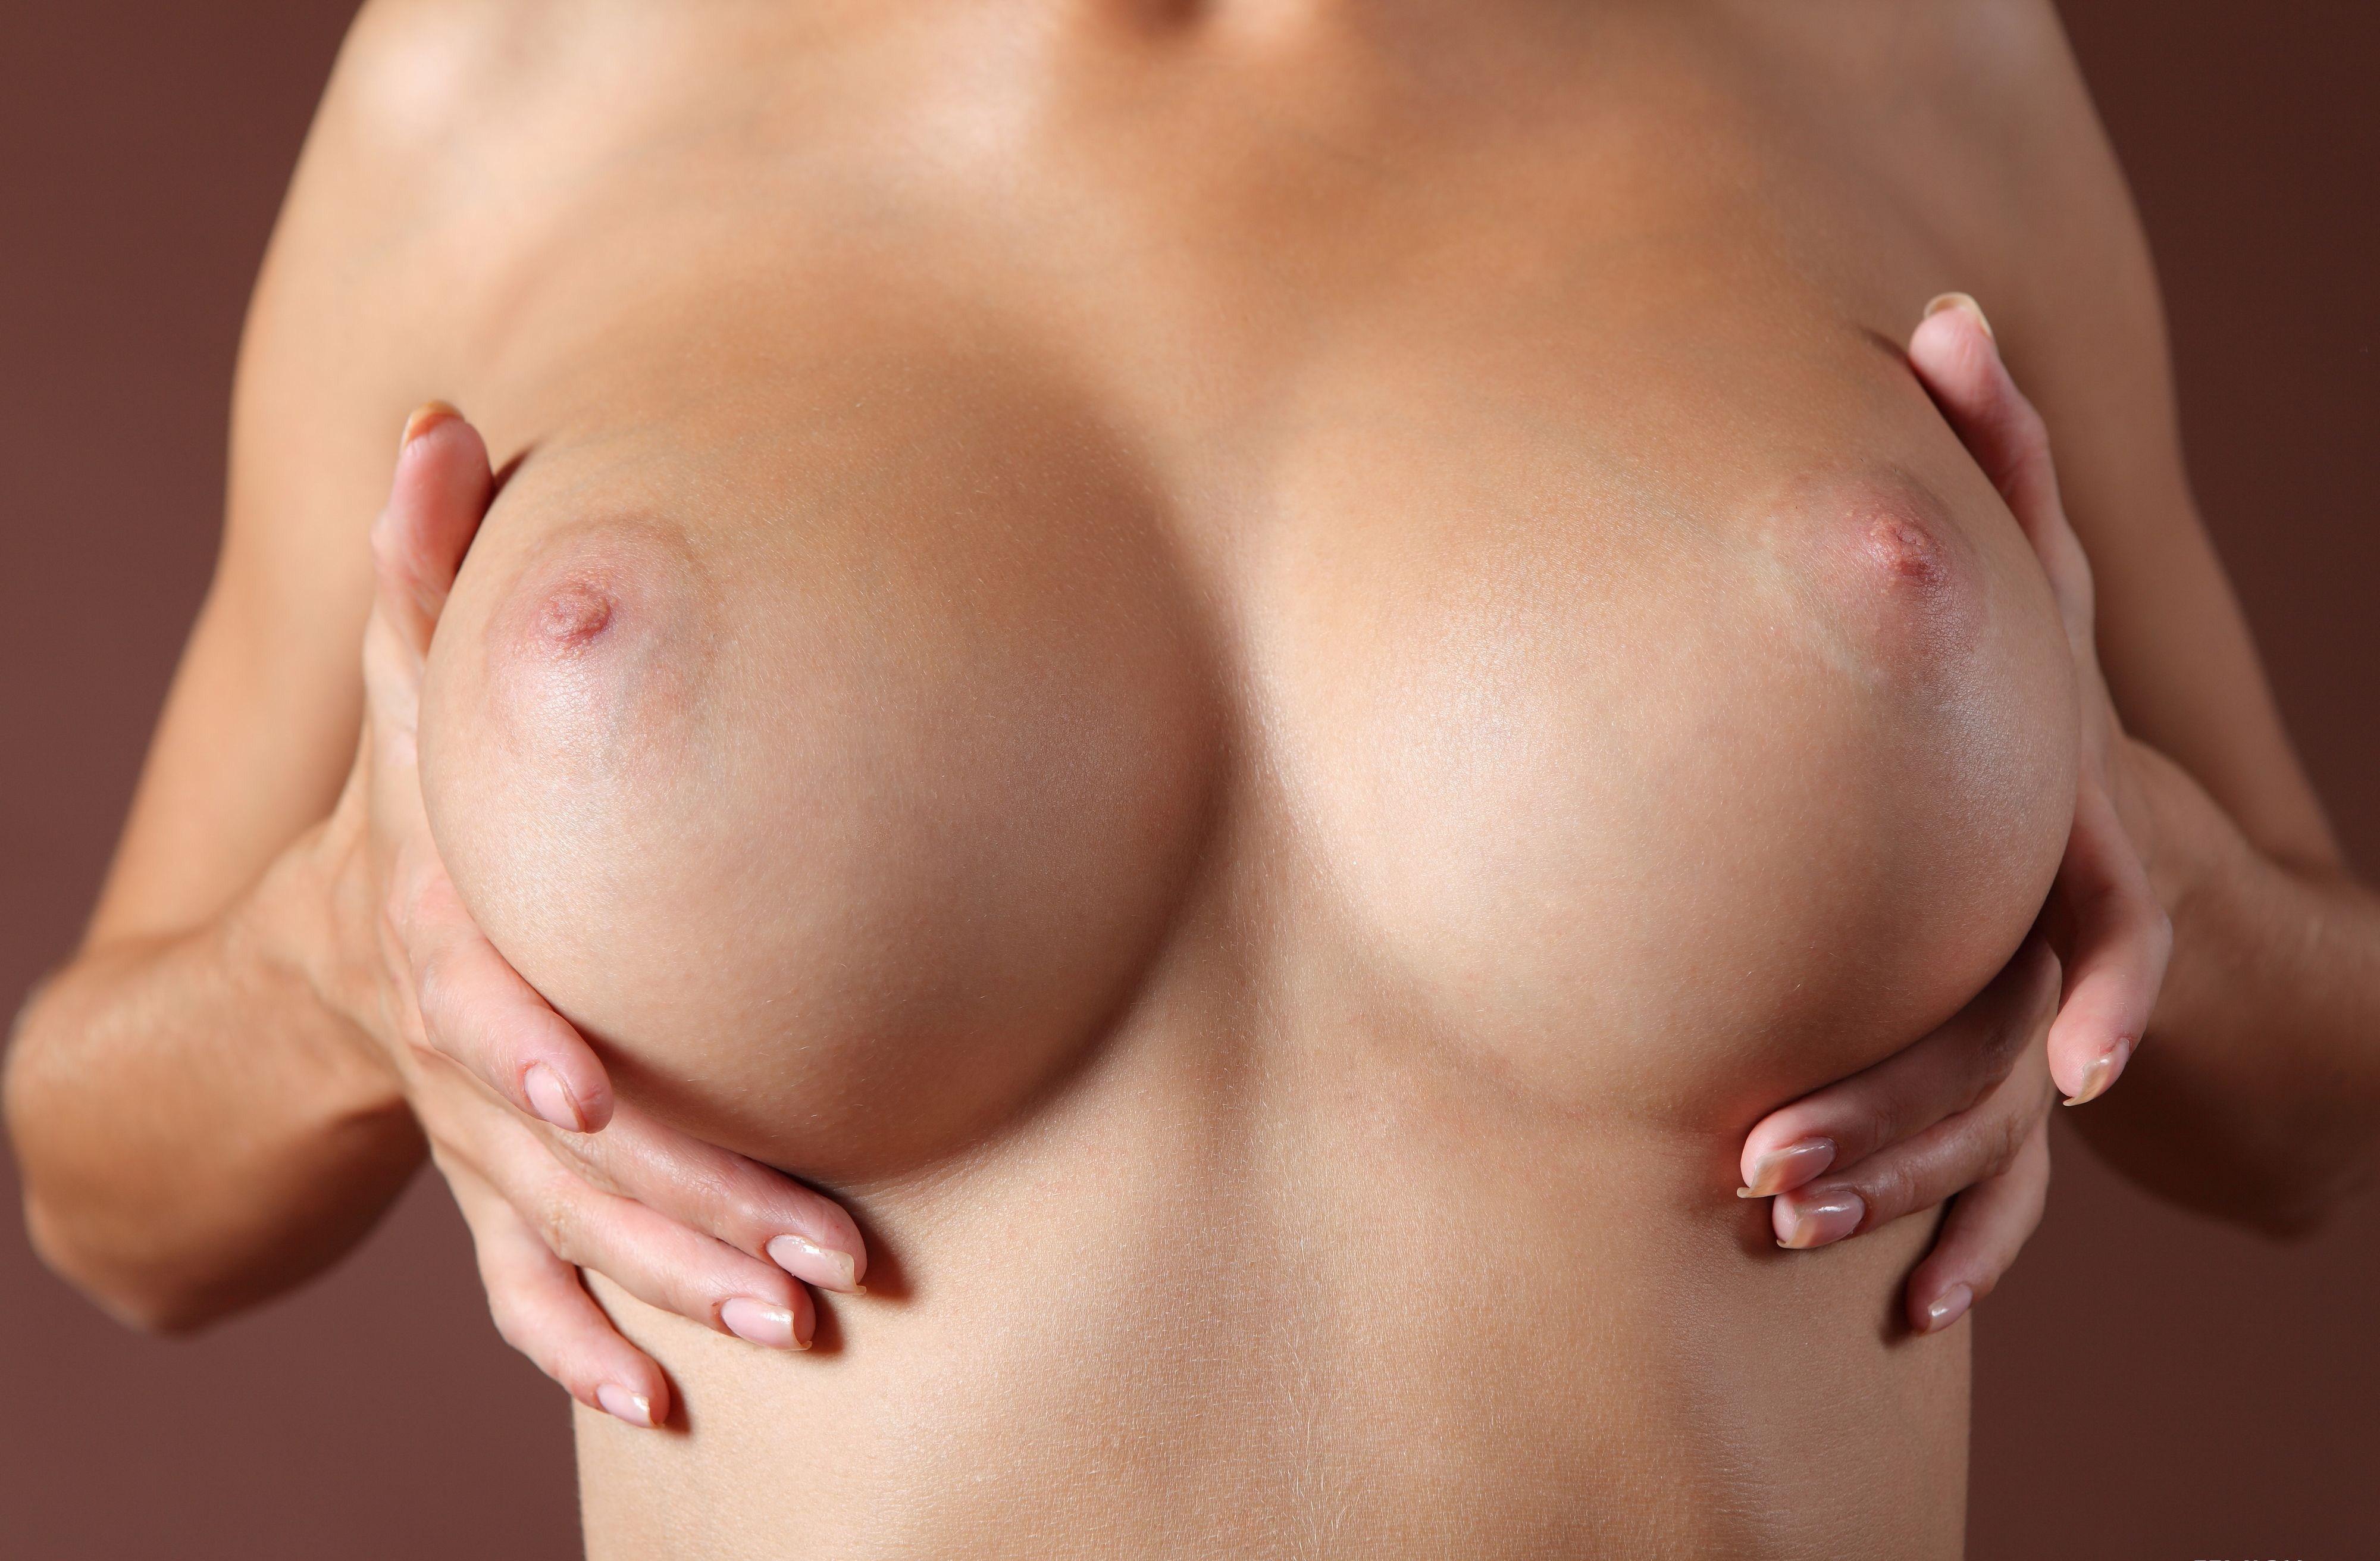 squeezing breast nude pics